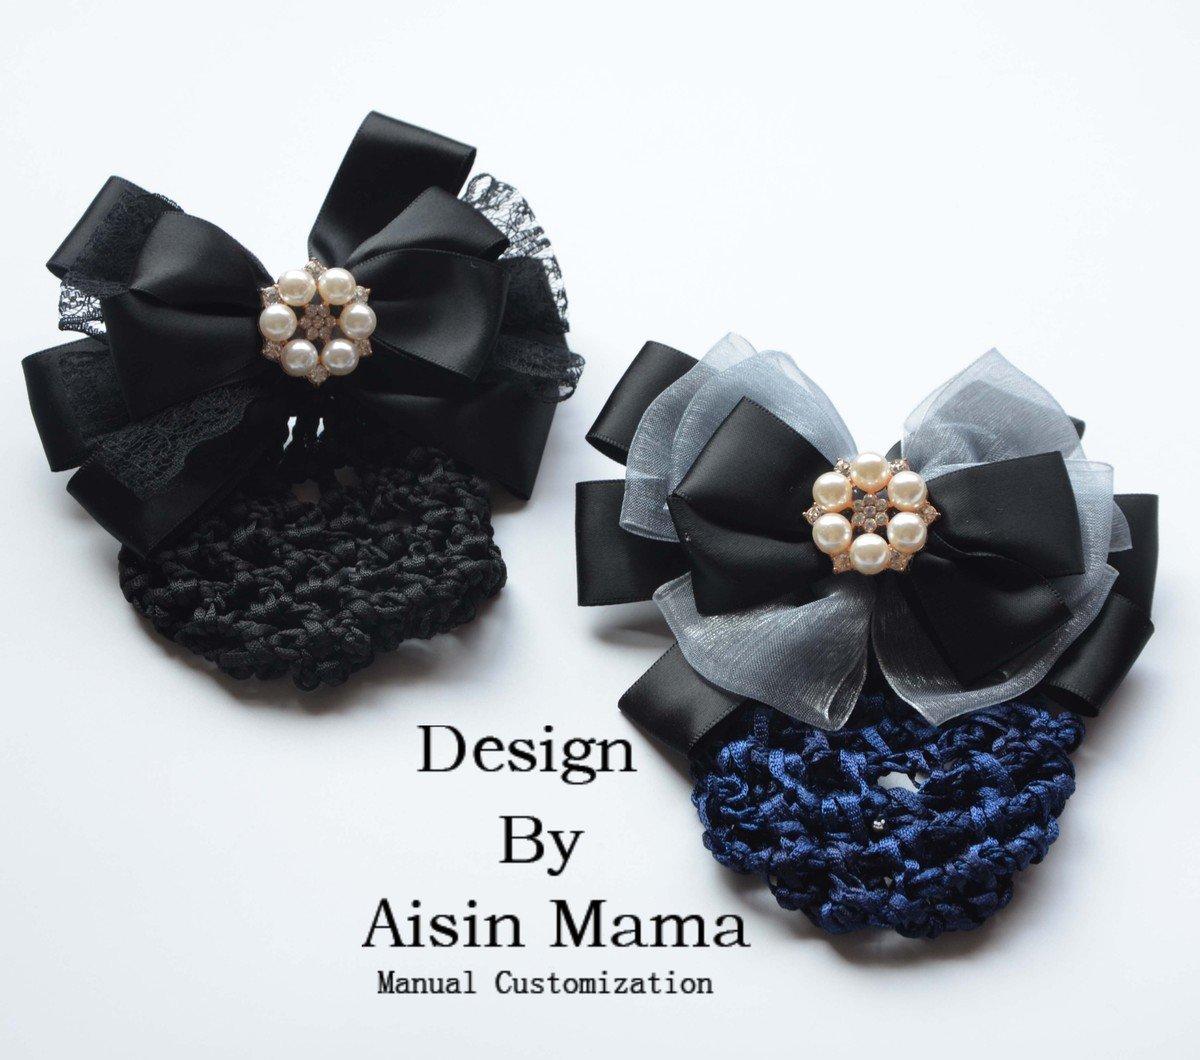 usongs 175 handmade custom pearl vocational nurse head flower hair ornaments disk string bag stewardess hotel hairnet bow hair accessories women girls